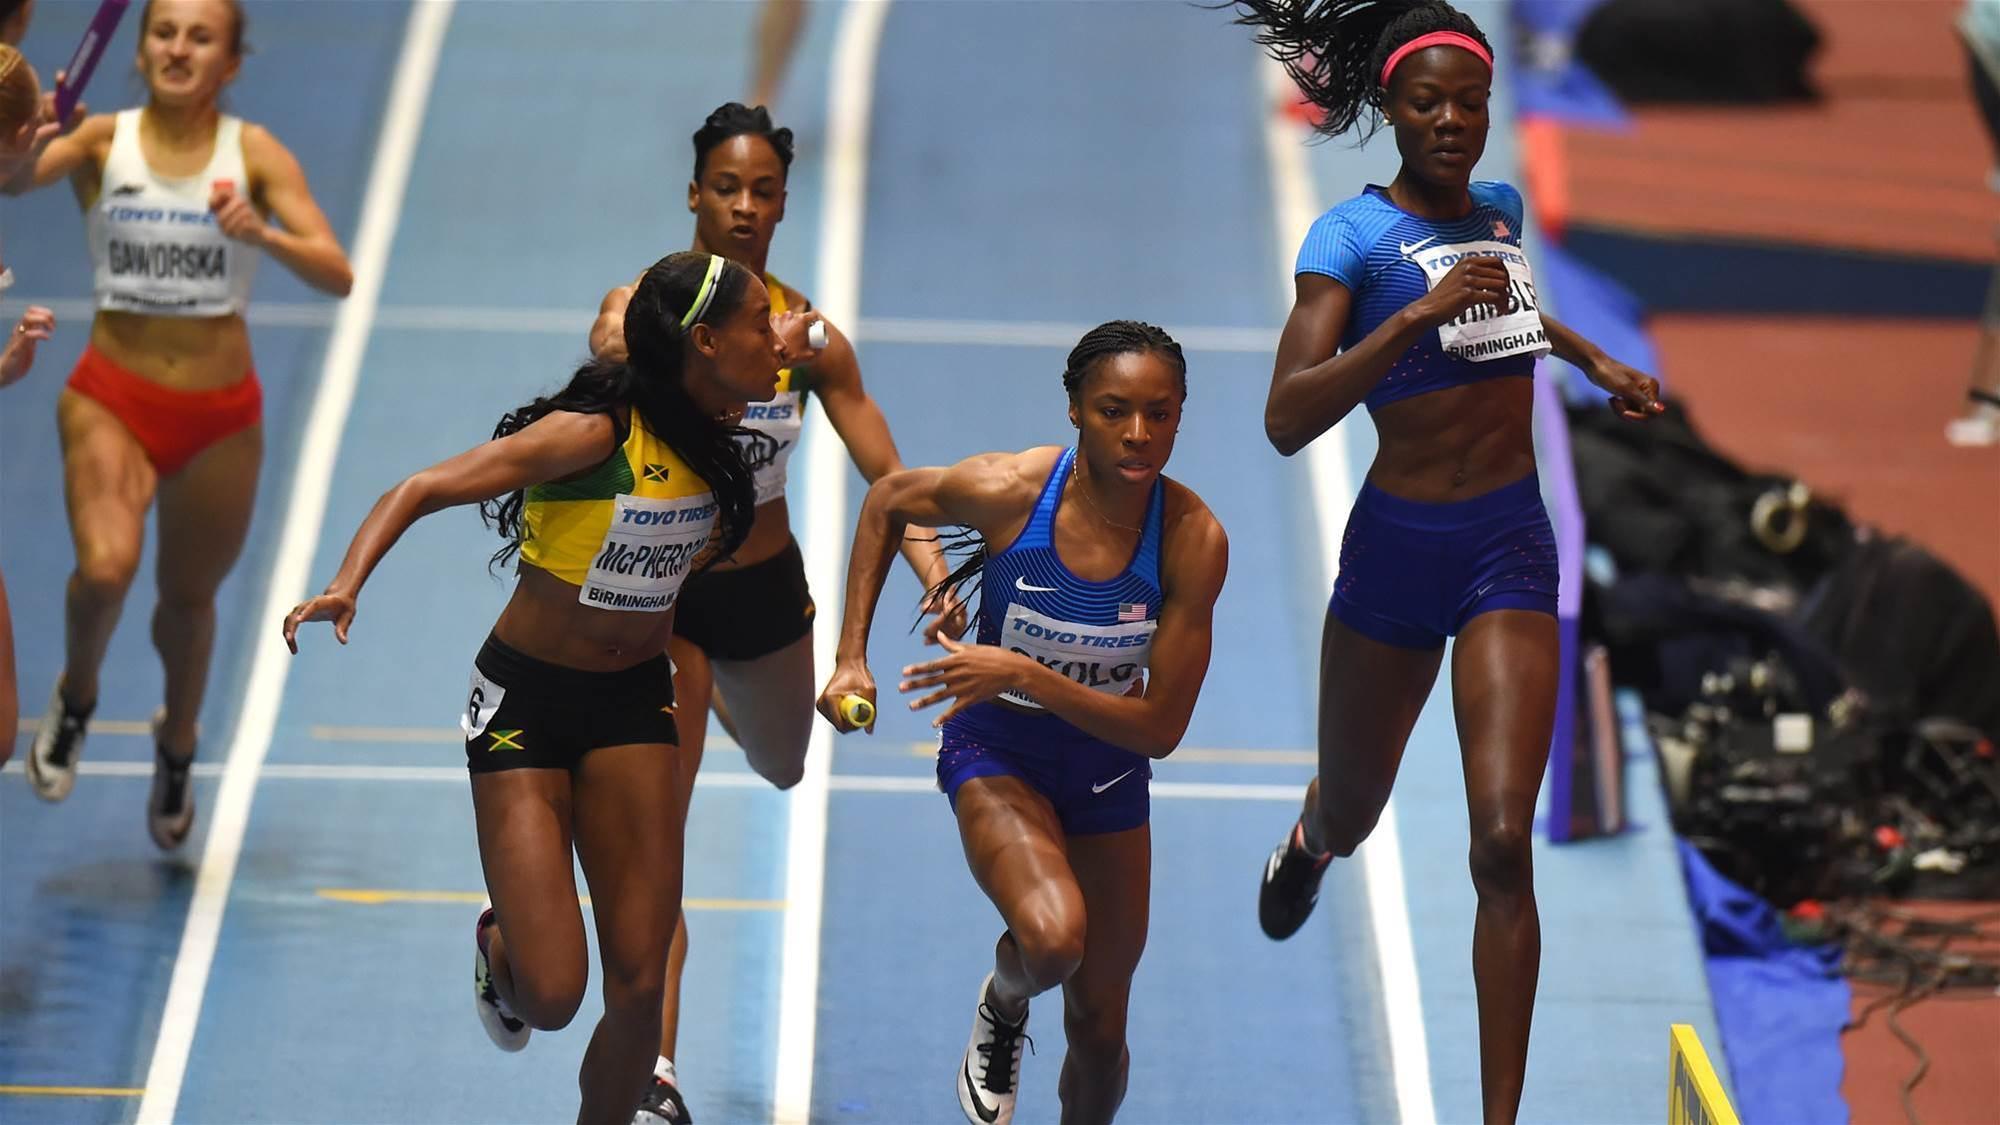 OPINION: IOC & IAAF ruling harming women in sport